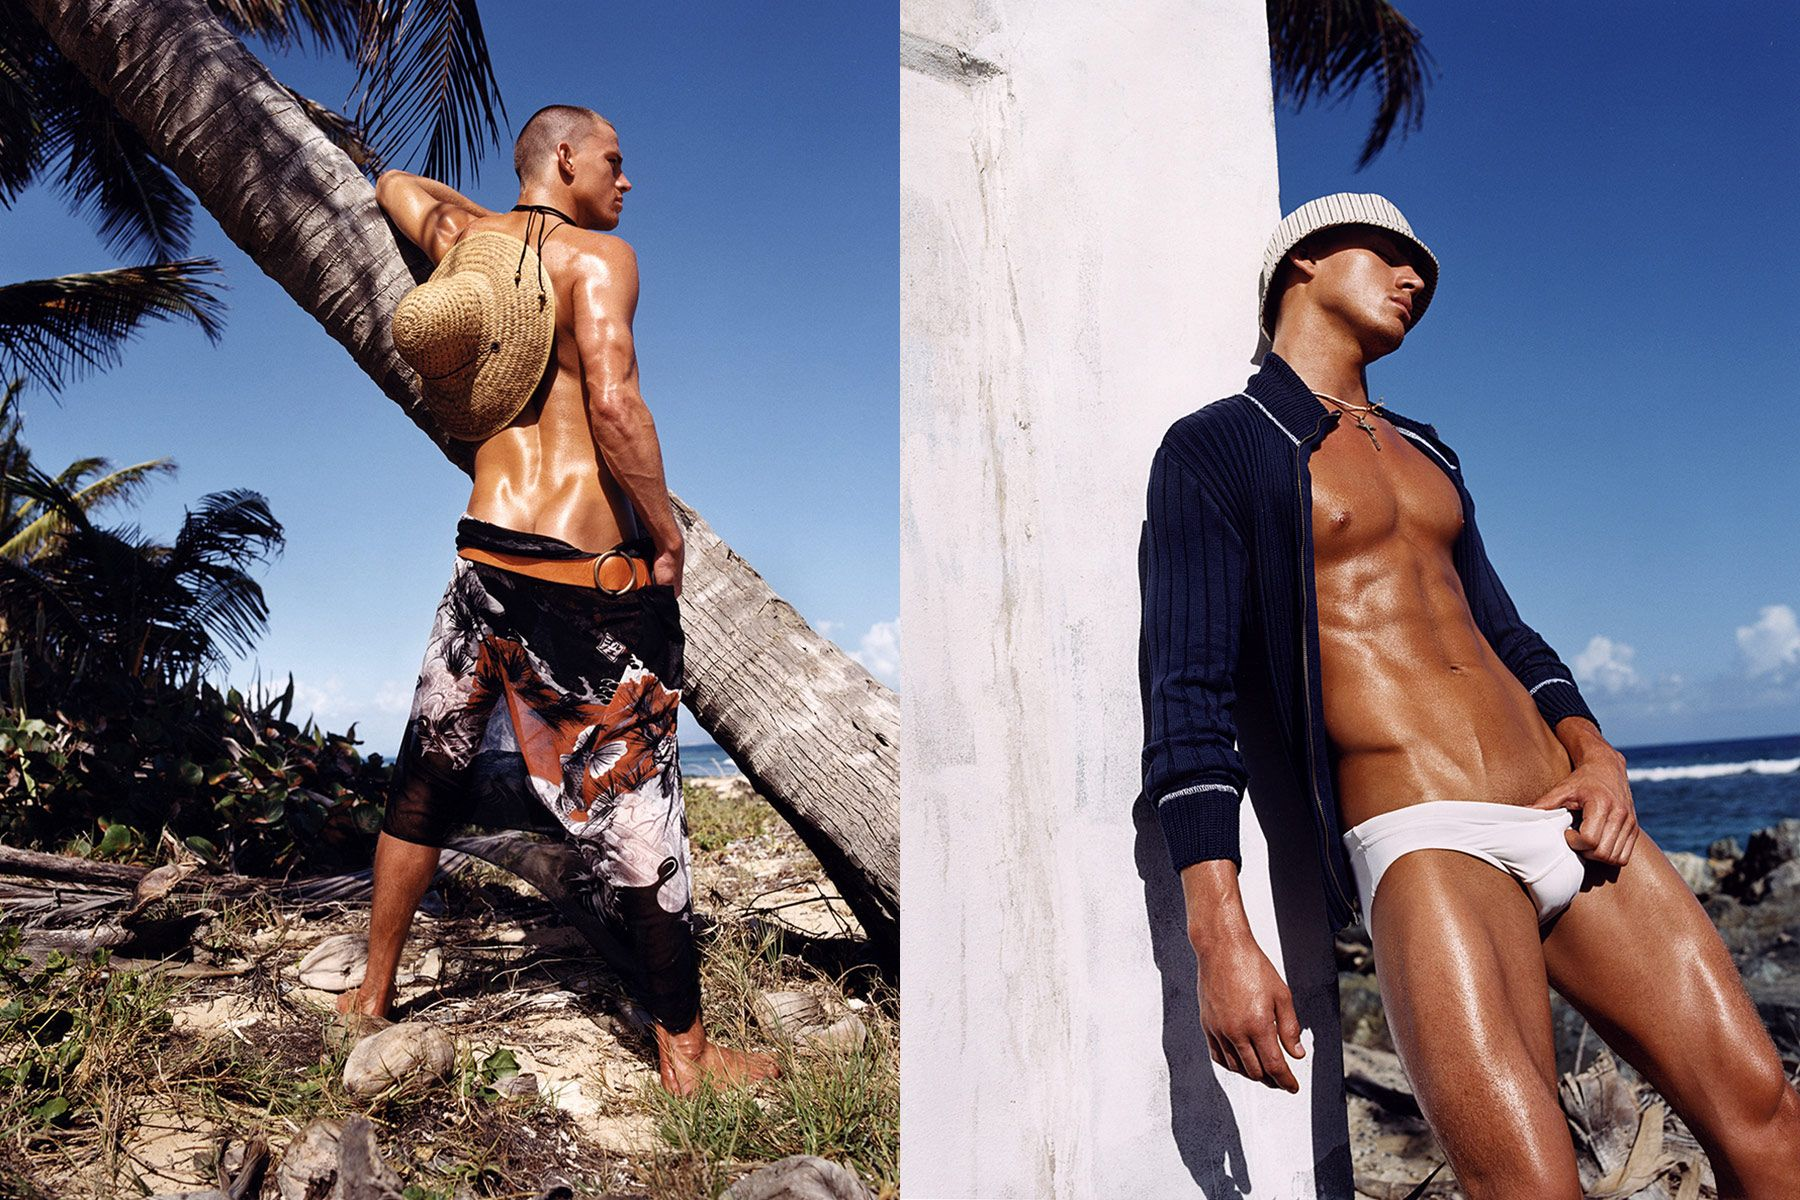 Channing_Tatum_Contents_Vieques_2002_dblpg_3.jpg